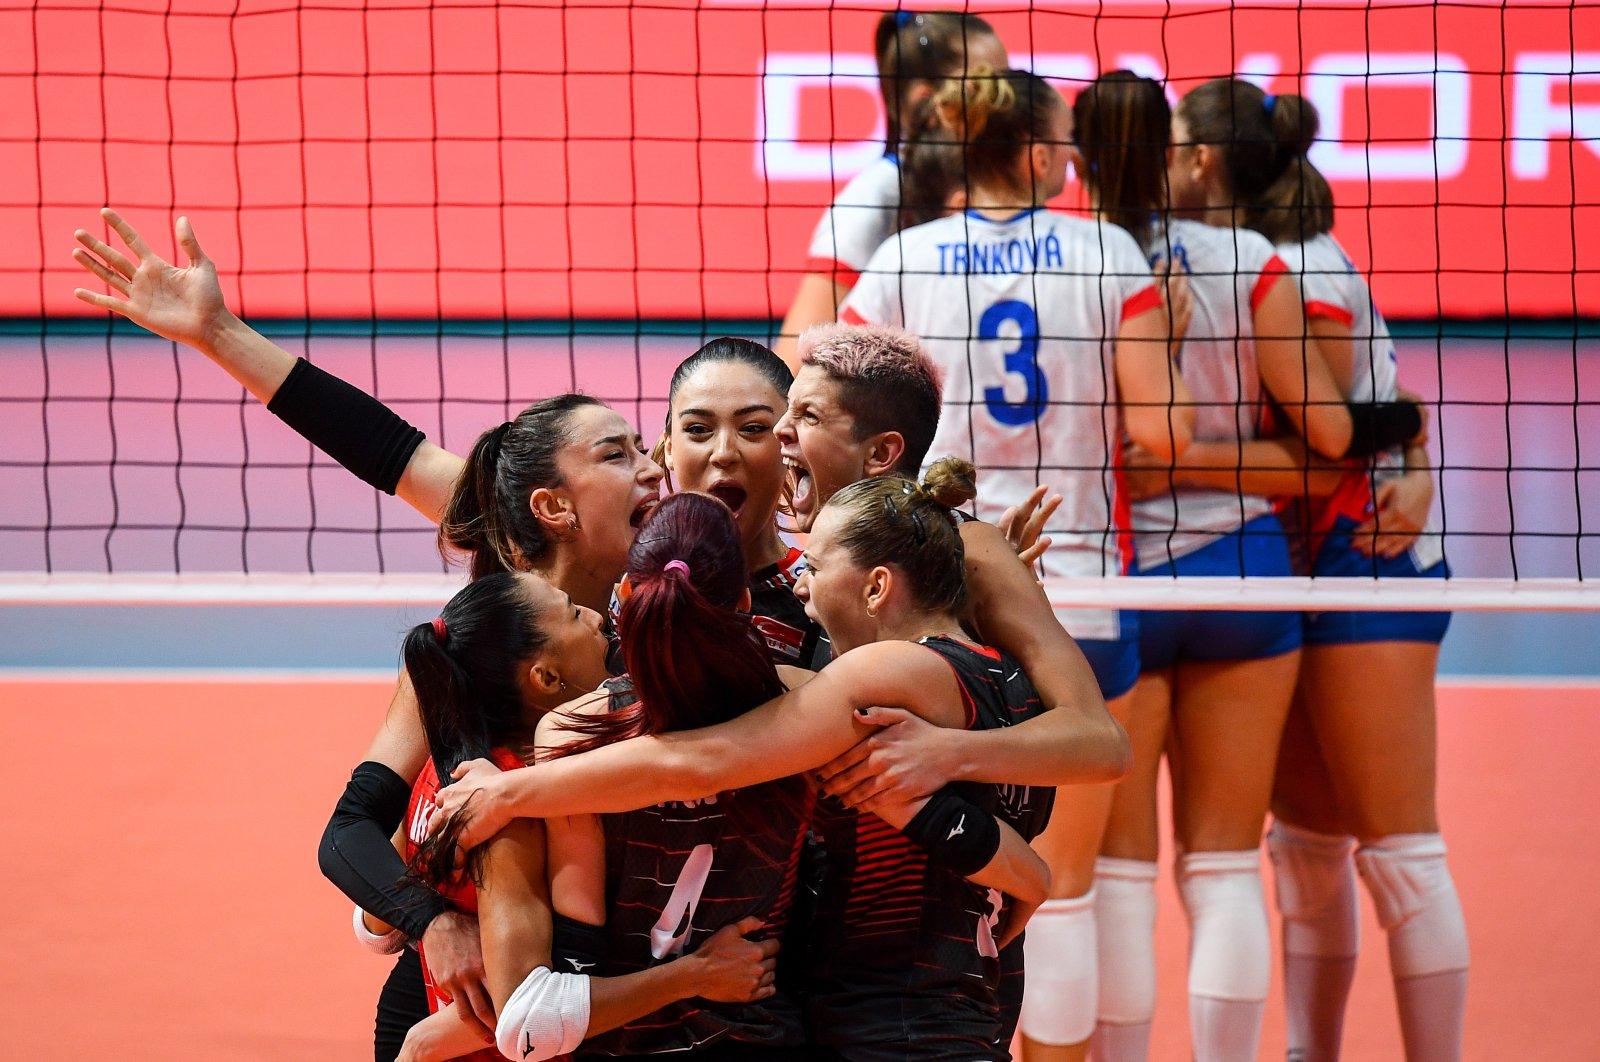 Turkey's national women's volleyball team at the Kolodruma Sports Hall in Plovdiv, Bulgaria, Sunday, Aug. 29, 2021. (AA Photo)